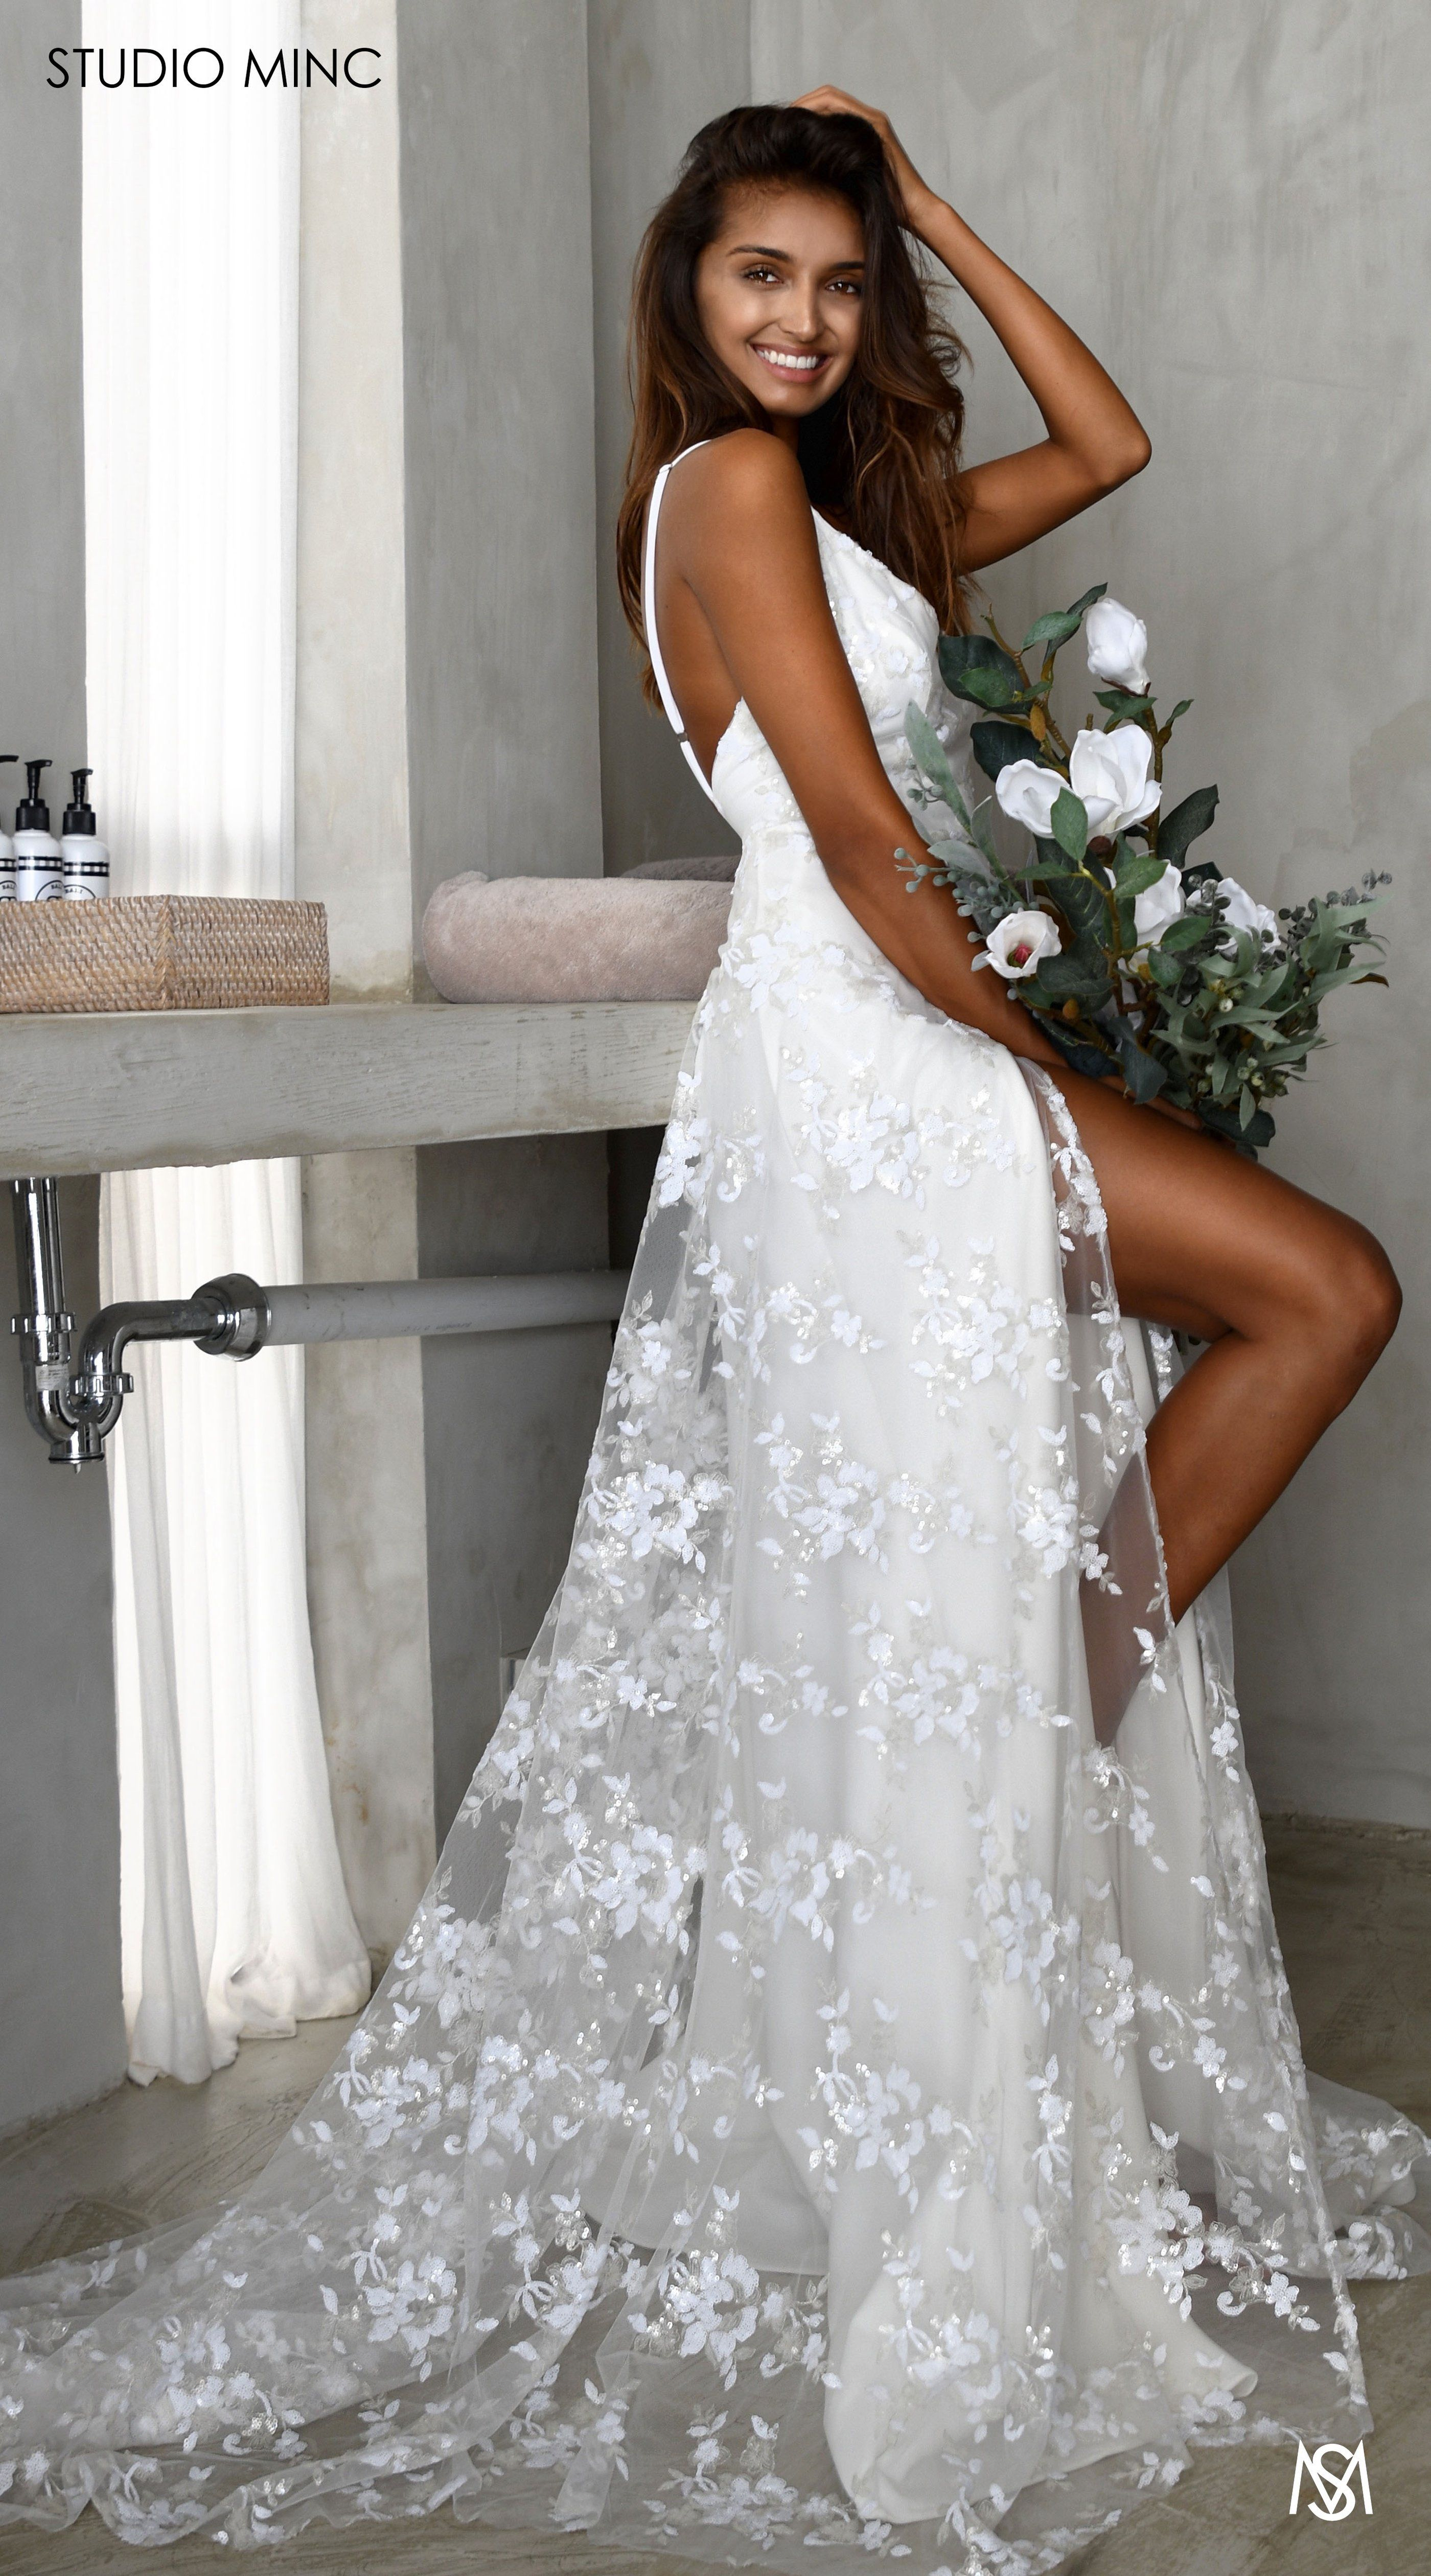 White Devotion Studio Minc Floral Sequin Net With Leg Split And Train Feminine Bridal Big Wedding Dresses Wedding Dresses Embellished Lace Wedding Dress [ 5040 x 2800 Pixel ]